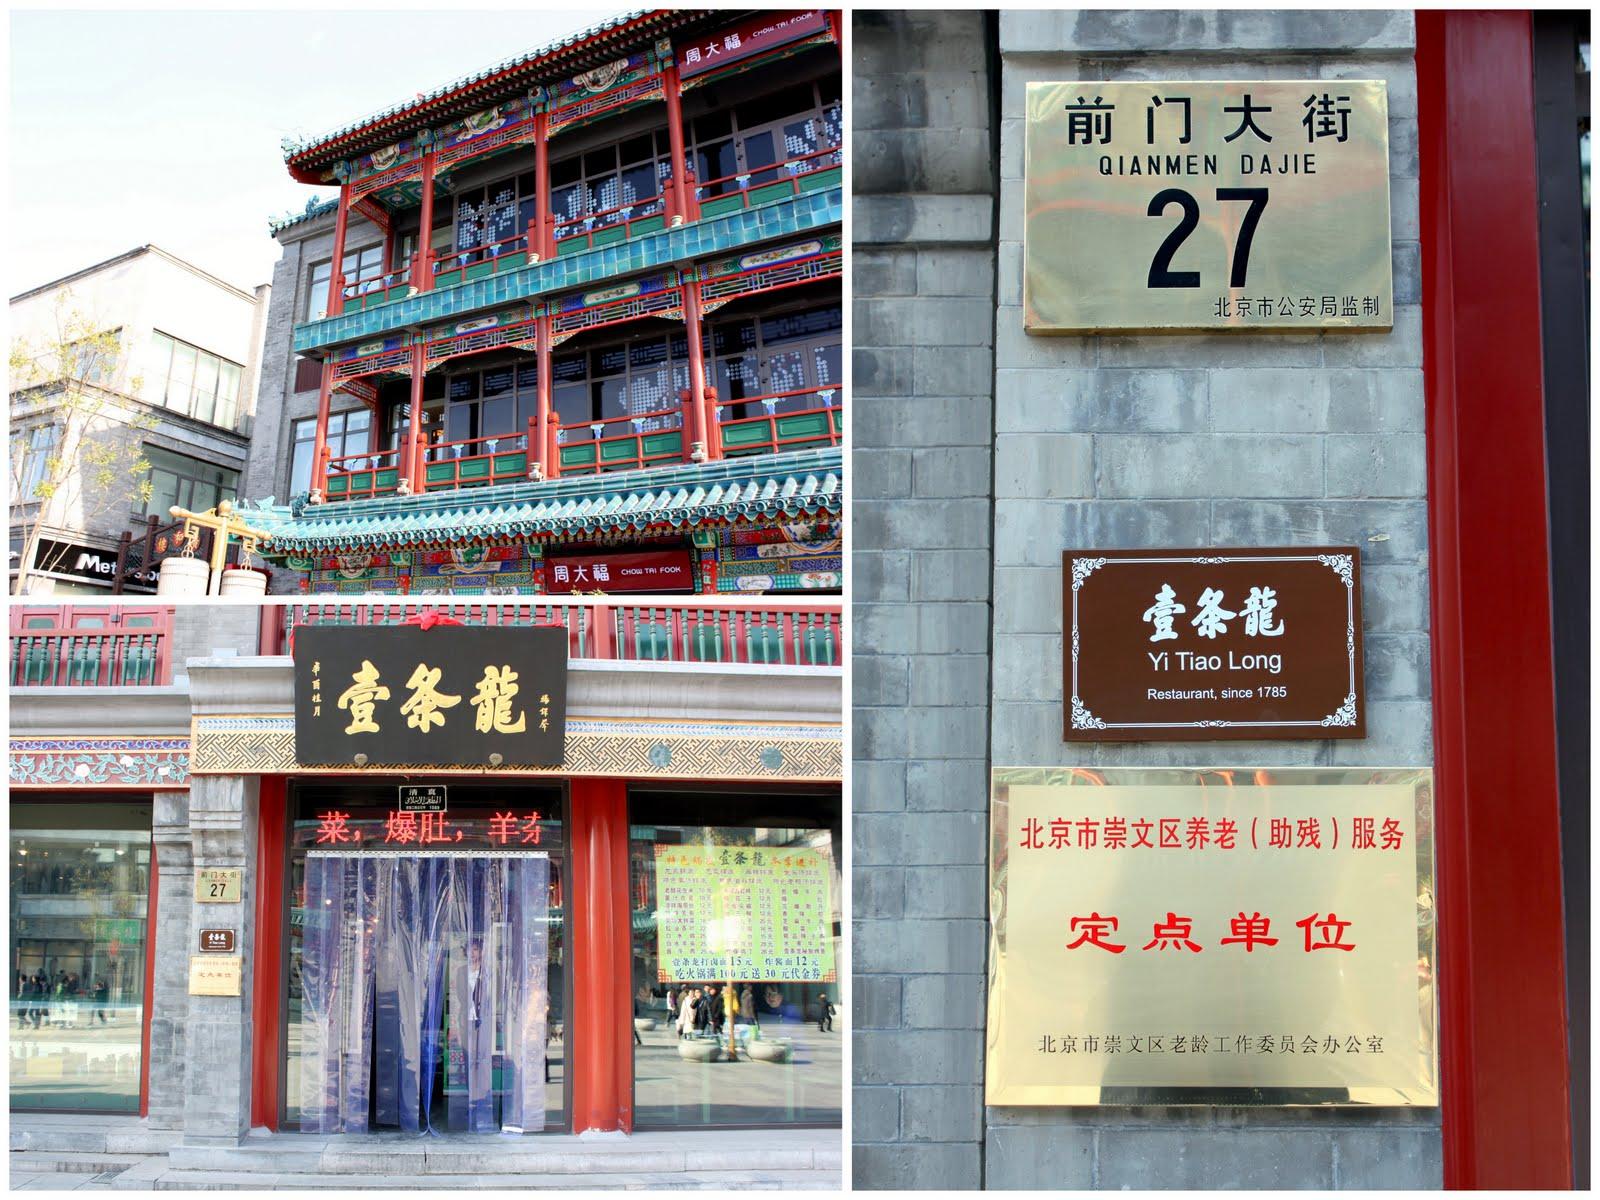 Hasil gambar untuk yi tiao long restaurant